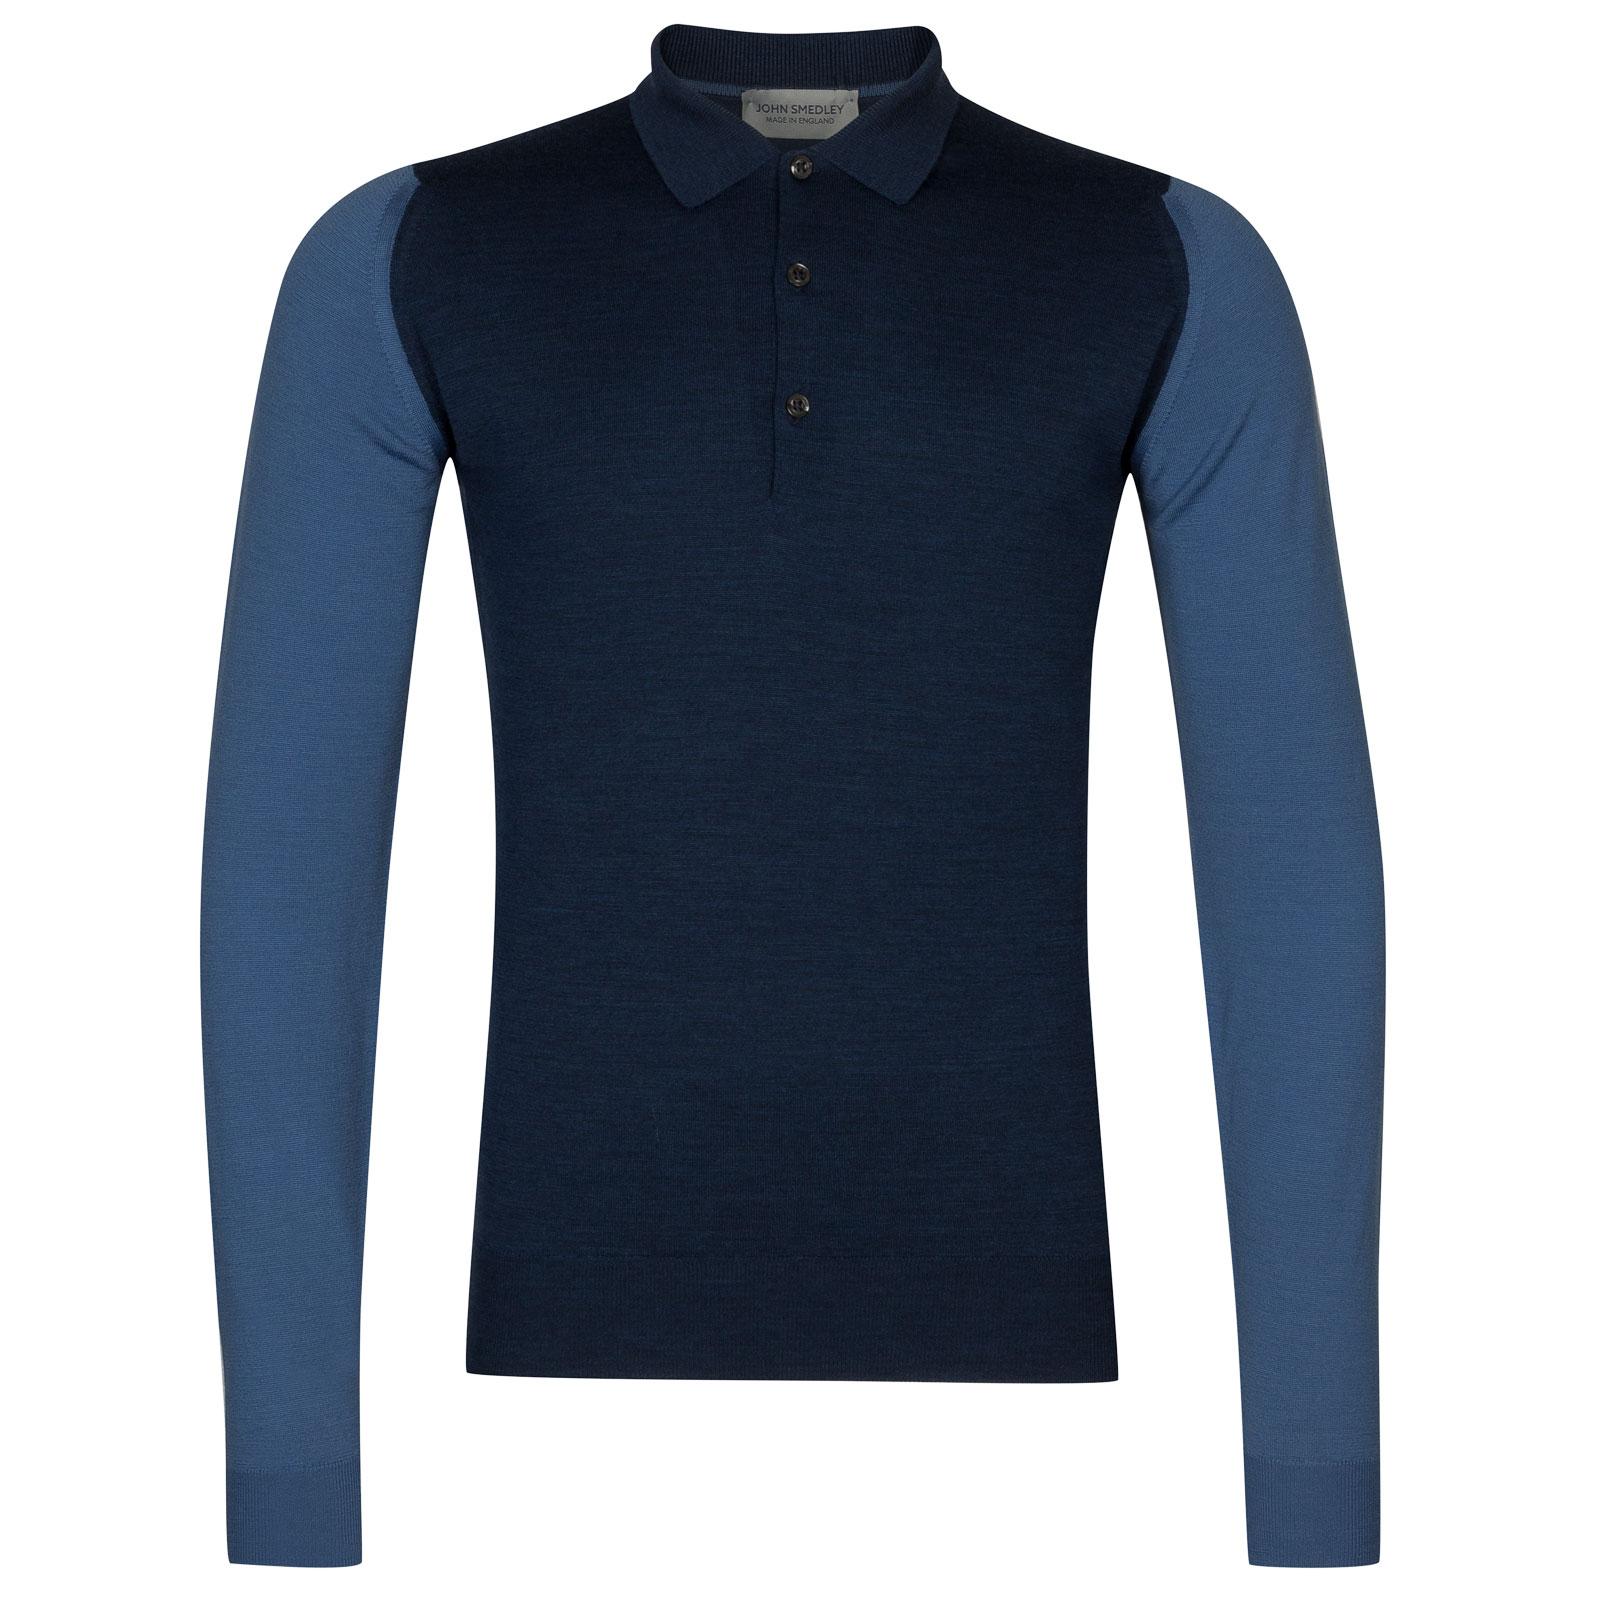 John Smedley Brightgate Merino Wool Shirt in Indigo/Derwent Blue-L